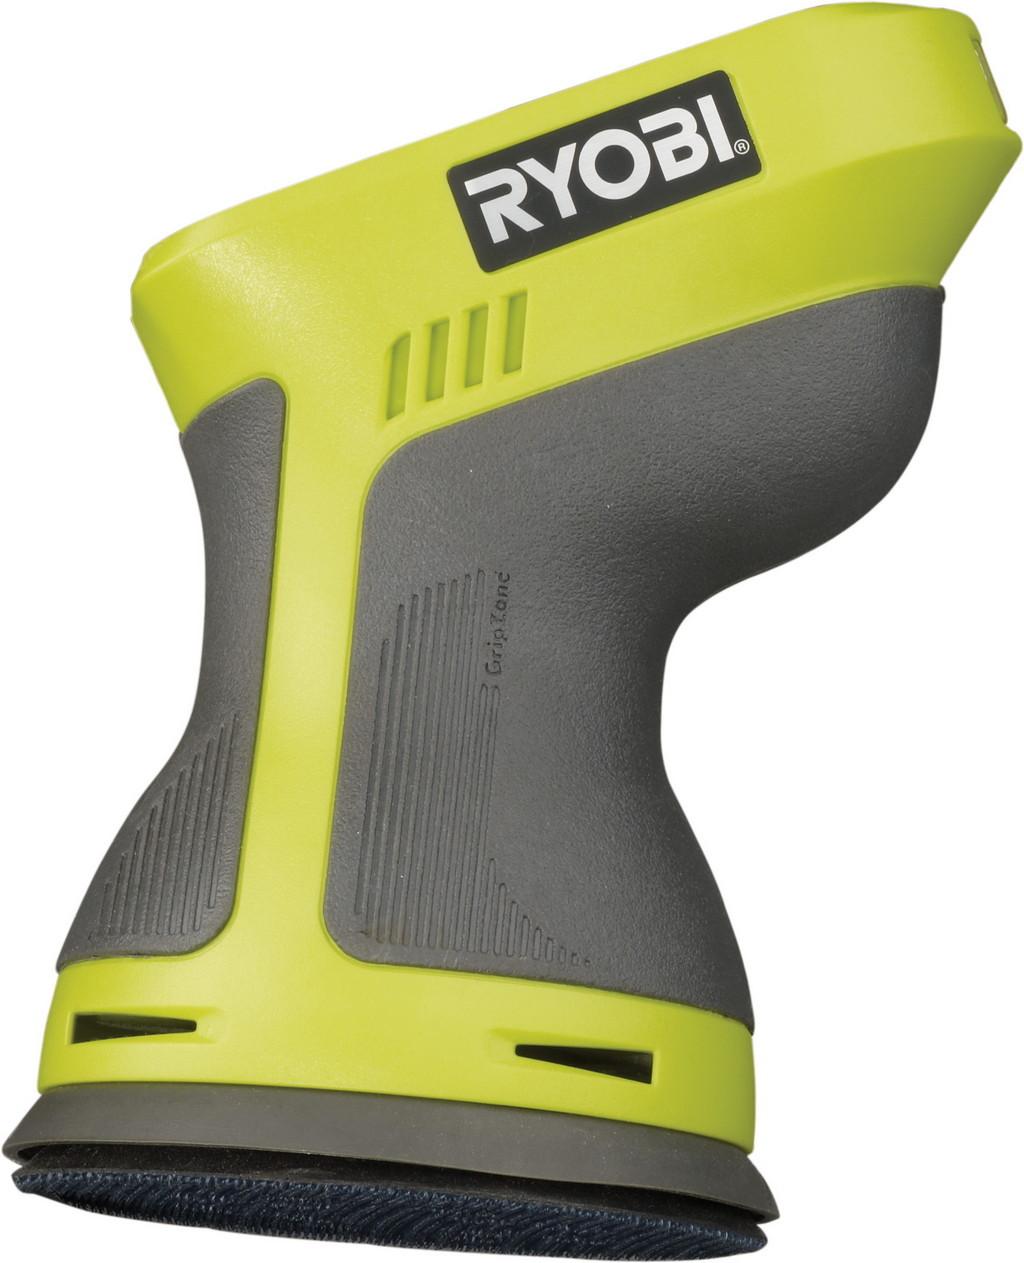 Ryobi CRO 180 MHG